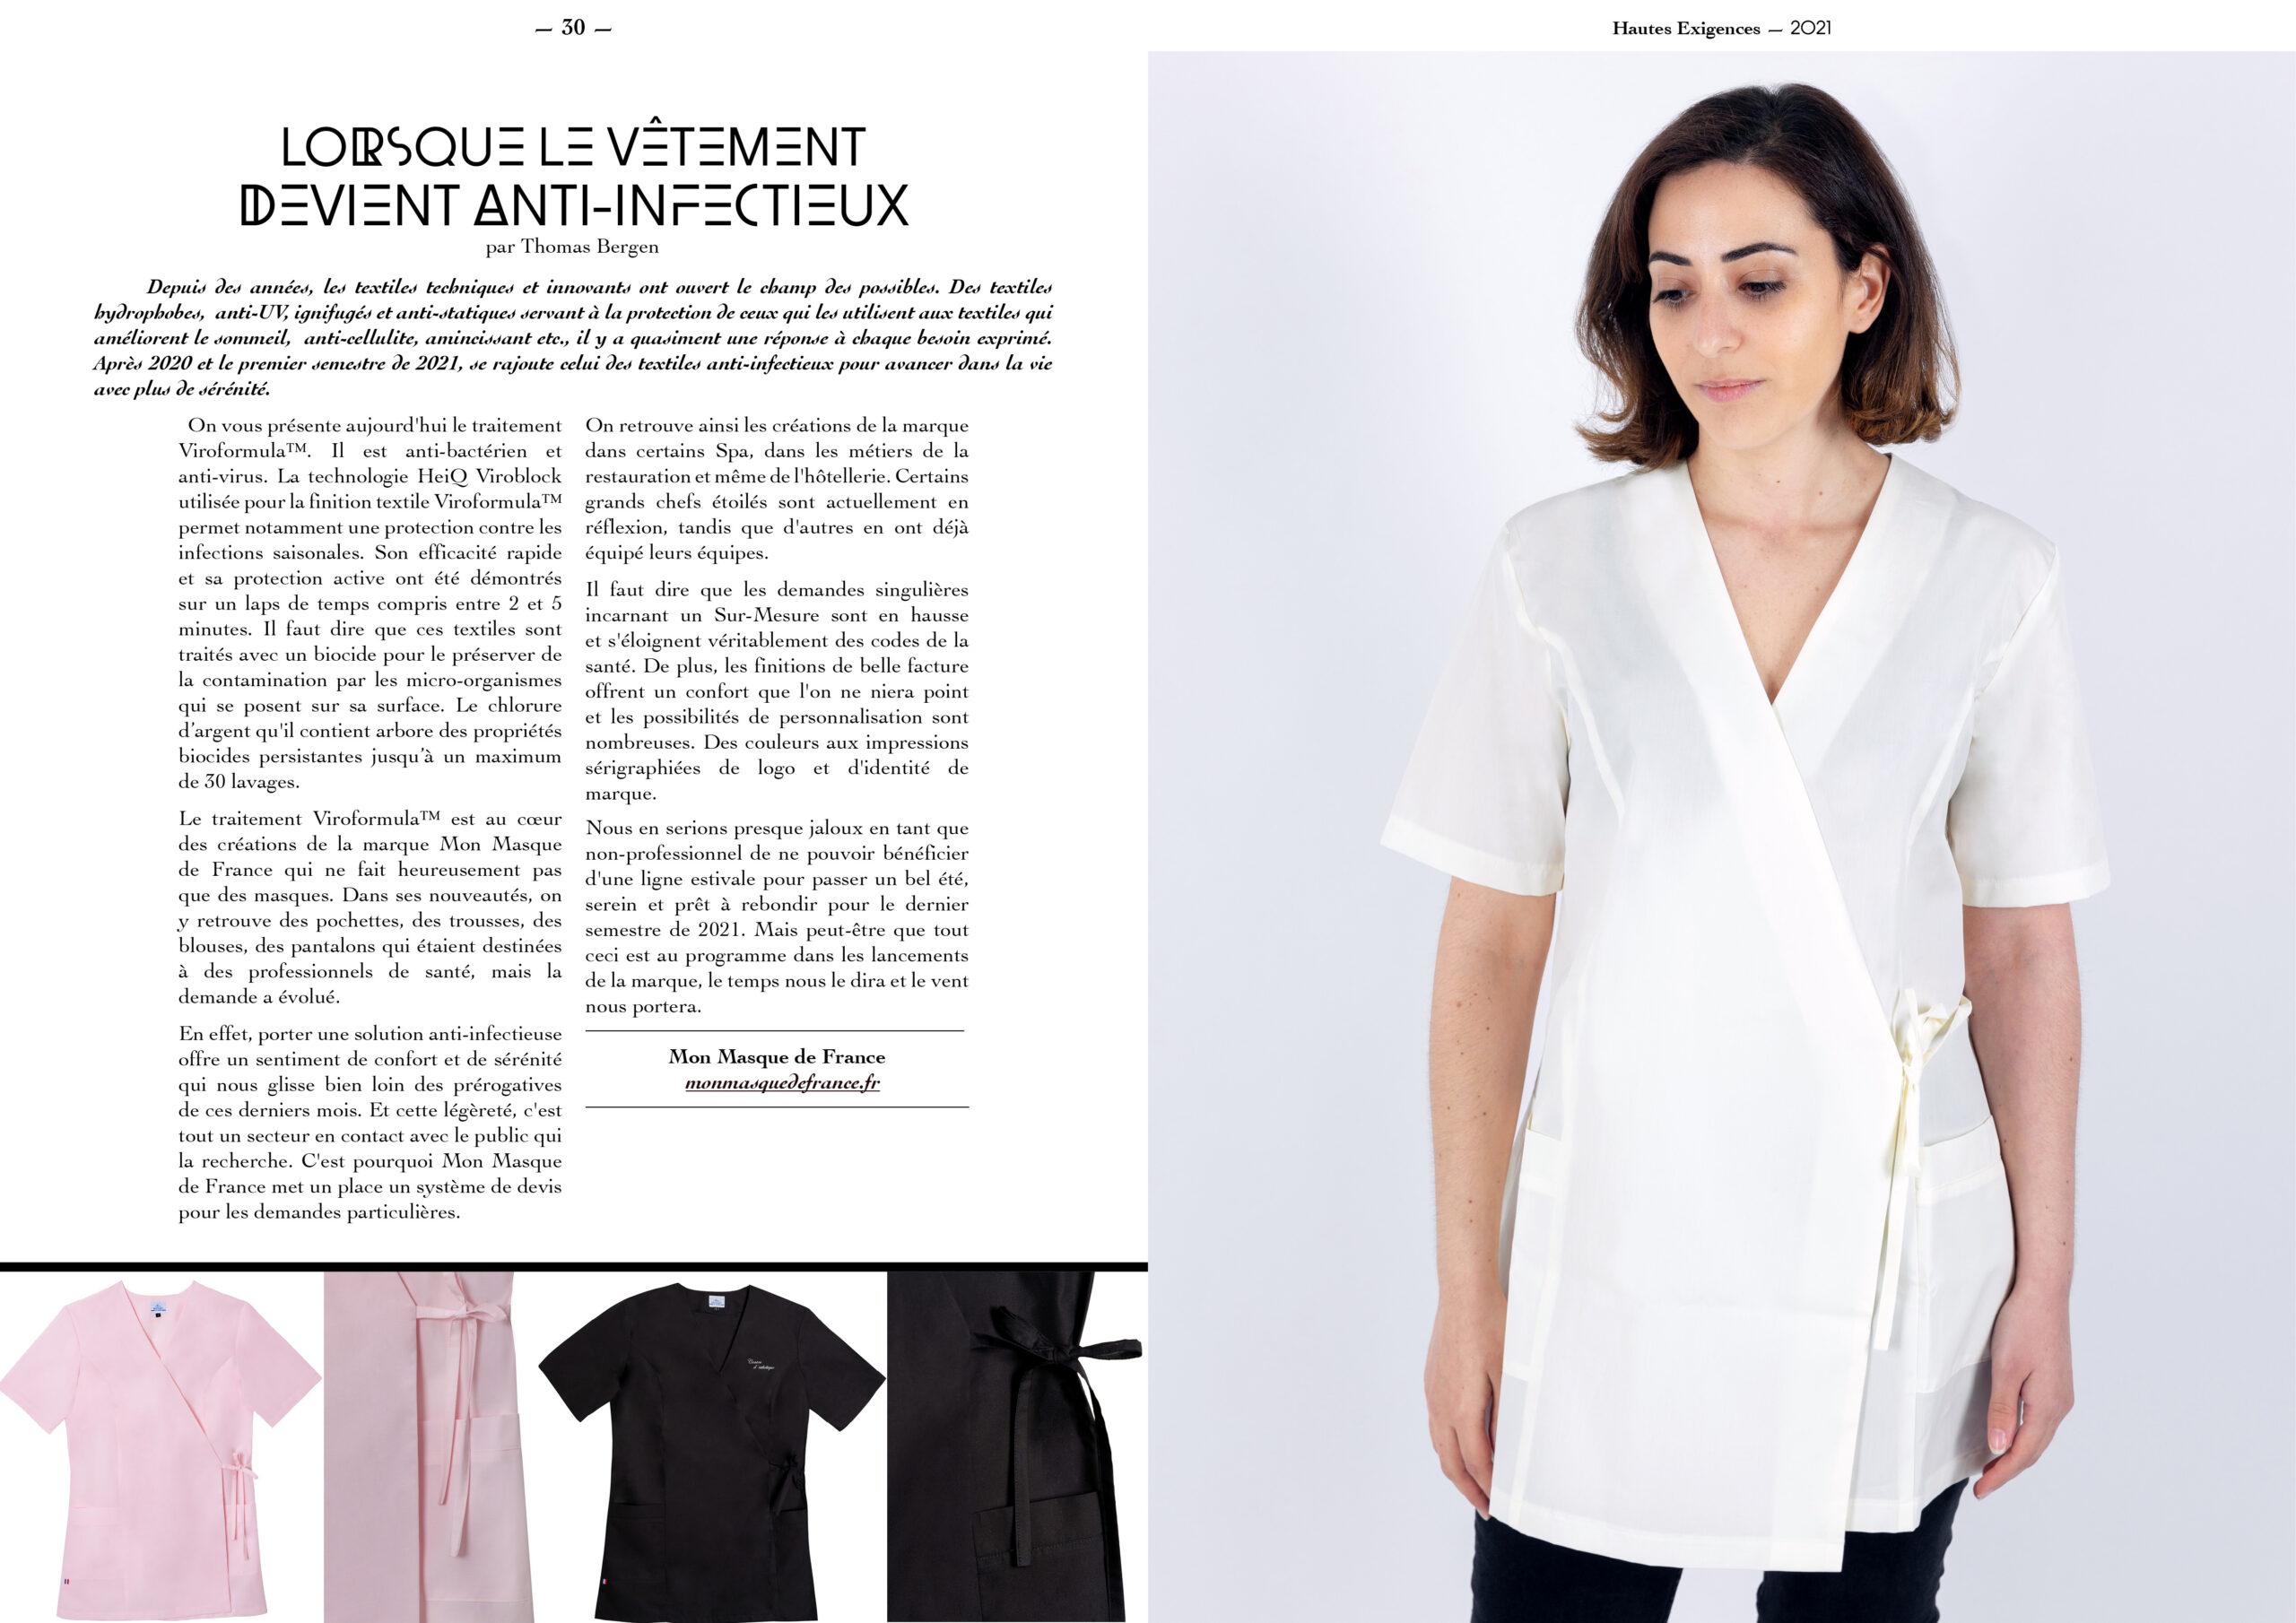 Hautes Exigences Magazine Hors Serie 2021 page 30-31